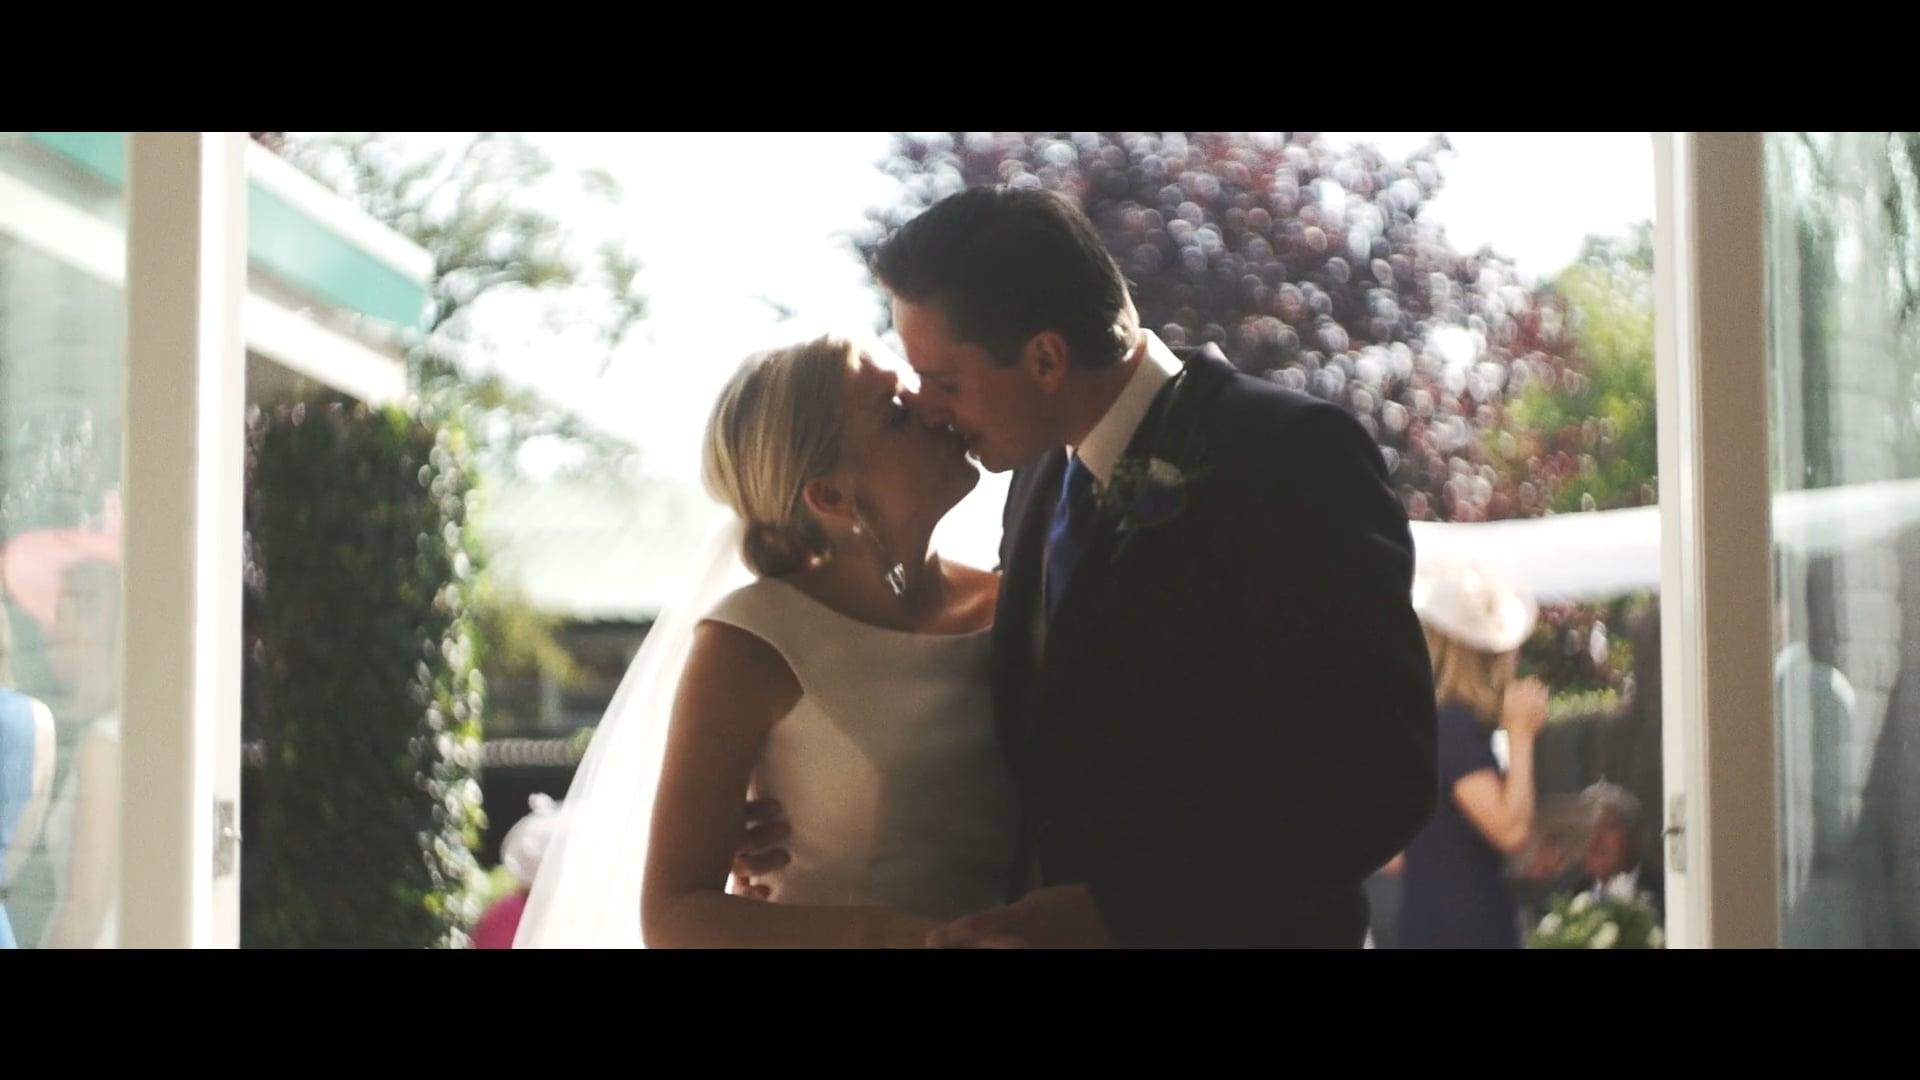 MARTHE & JAN-WILLEM - FULL FILM